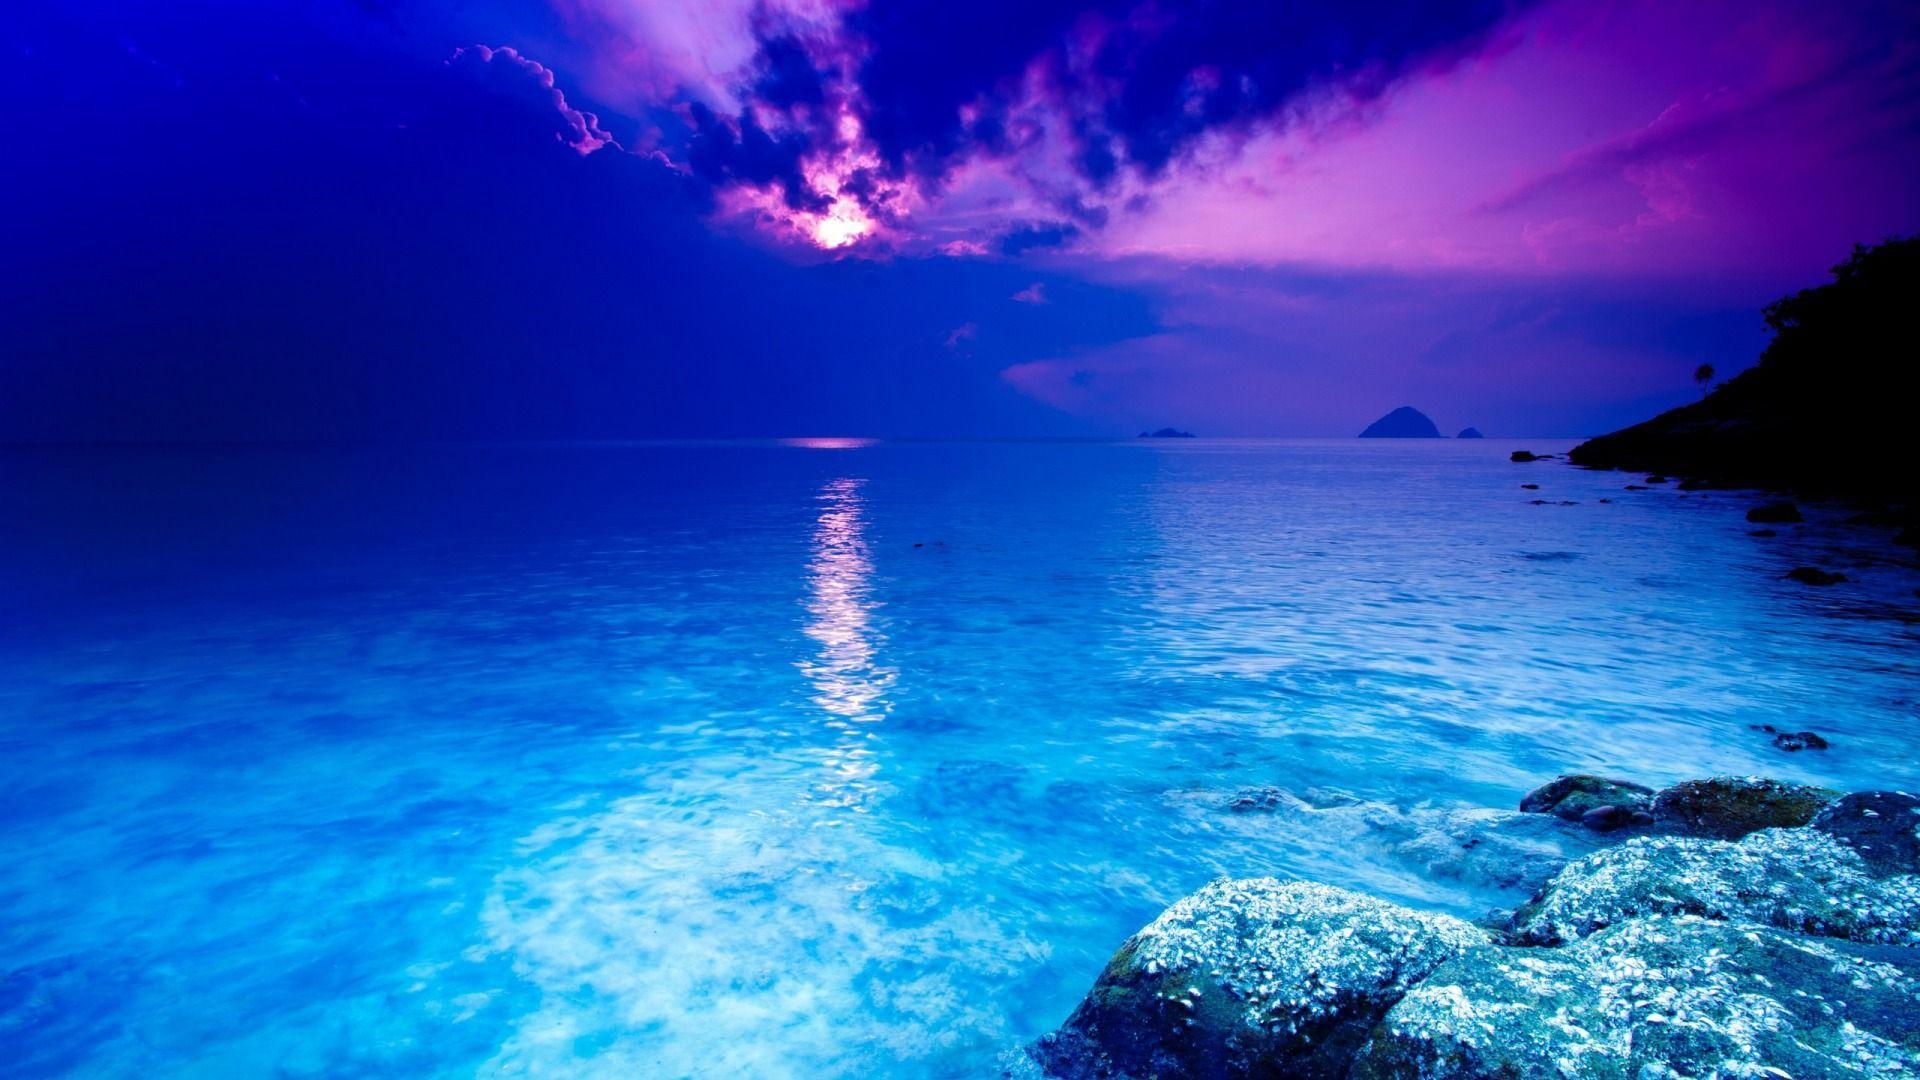 Ocean Themed hd wallpaper 1080p for pc